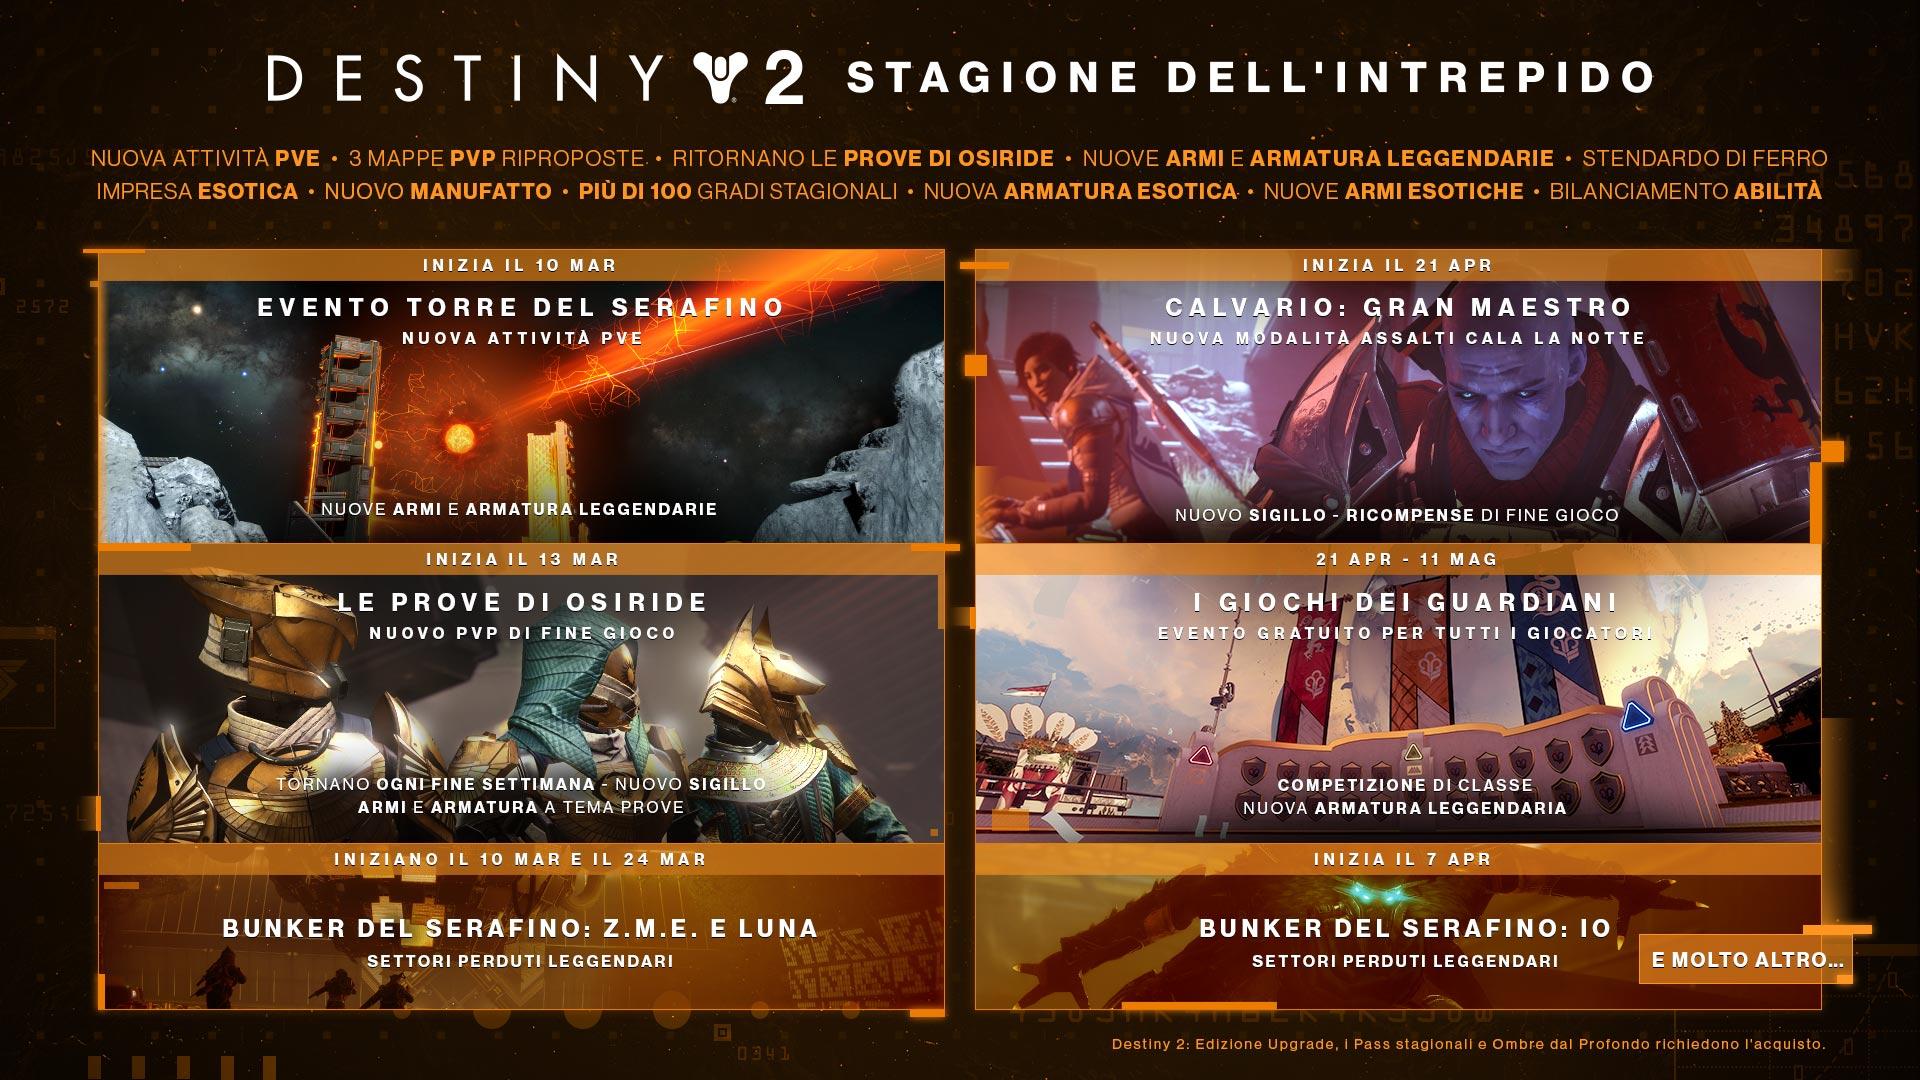 Destiny 2 Season of the Intrepid